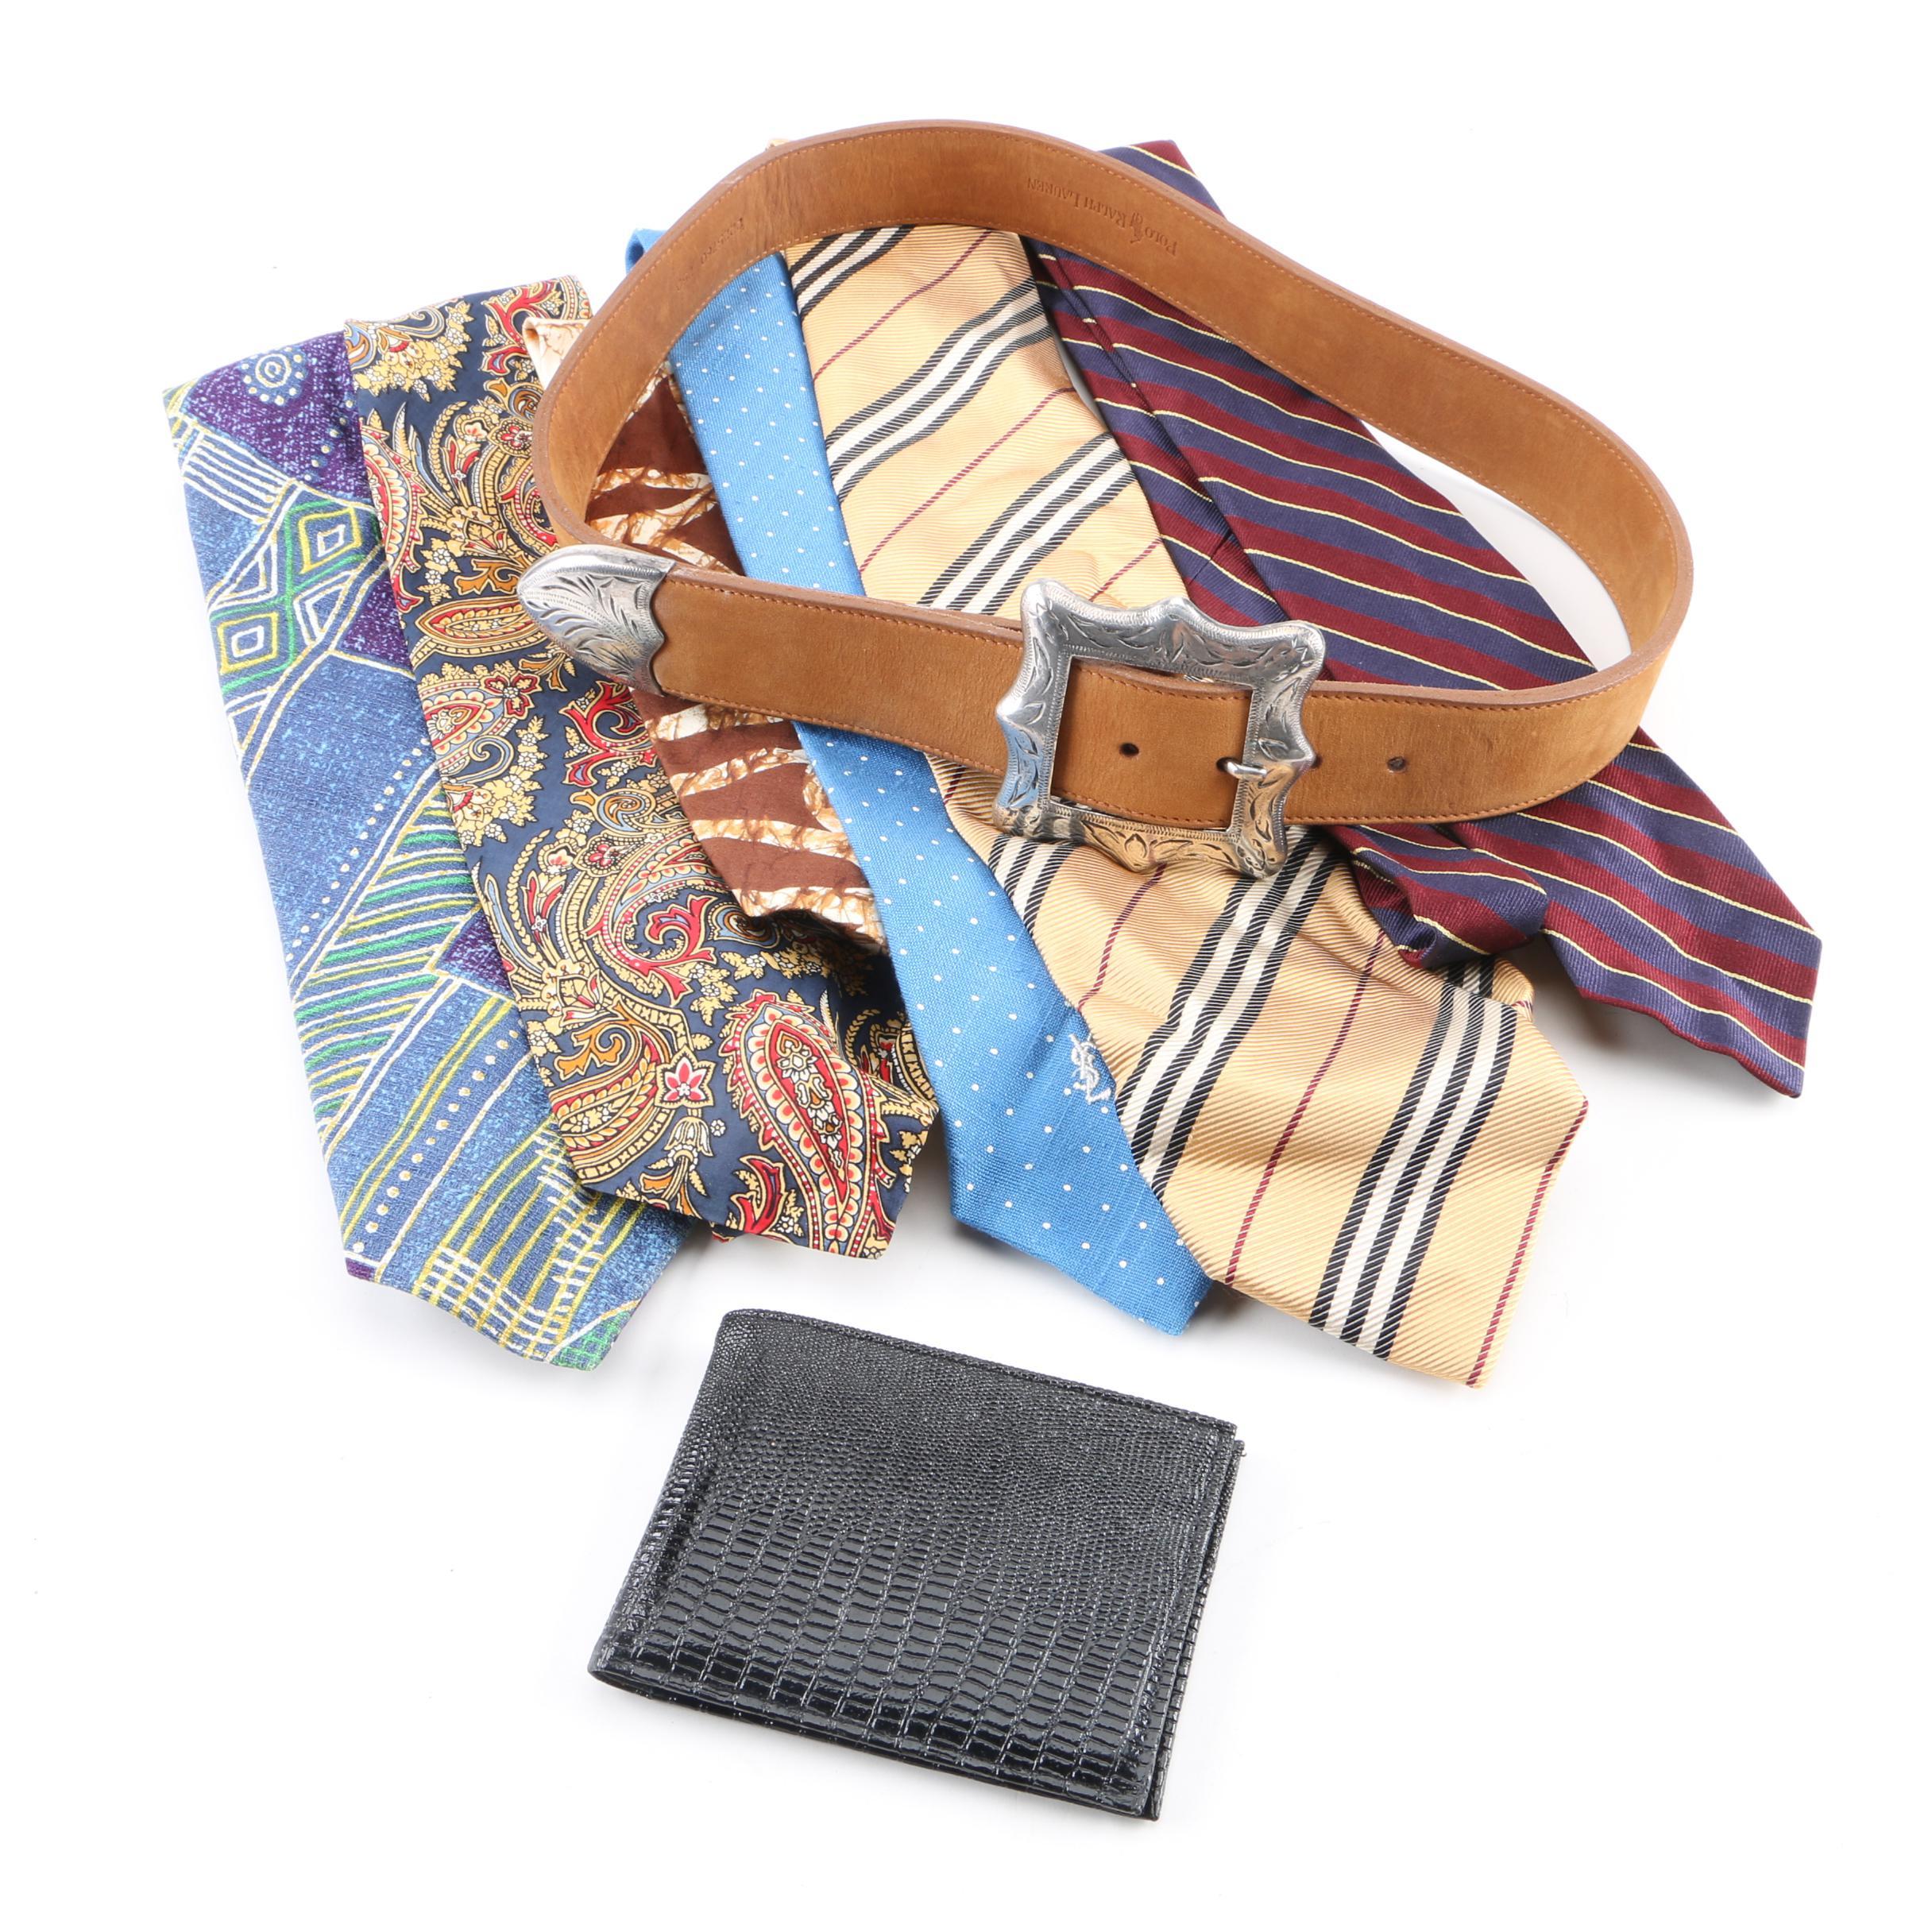 ... discount code for mens designer neckties leather belt and wallet  including burberry london 42619 30c85 ... d55ff09bad87c